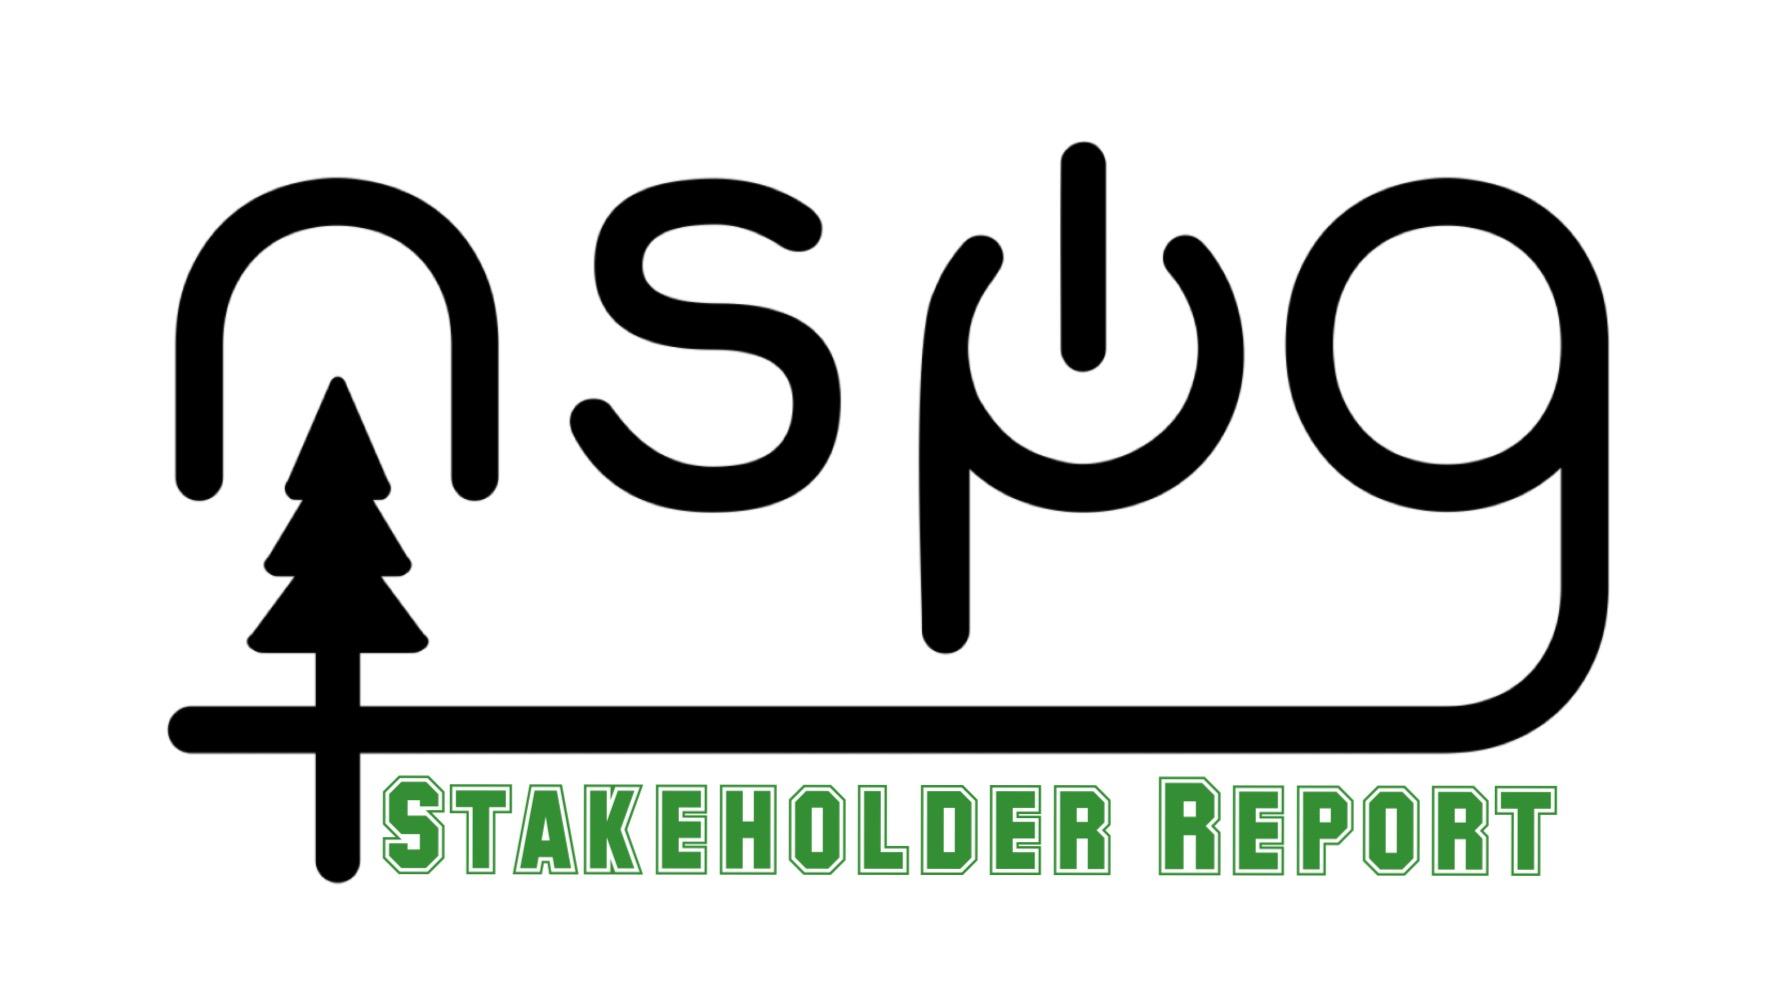 stakeholderlogoimage2.jpg